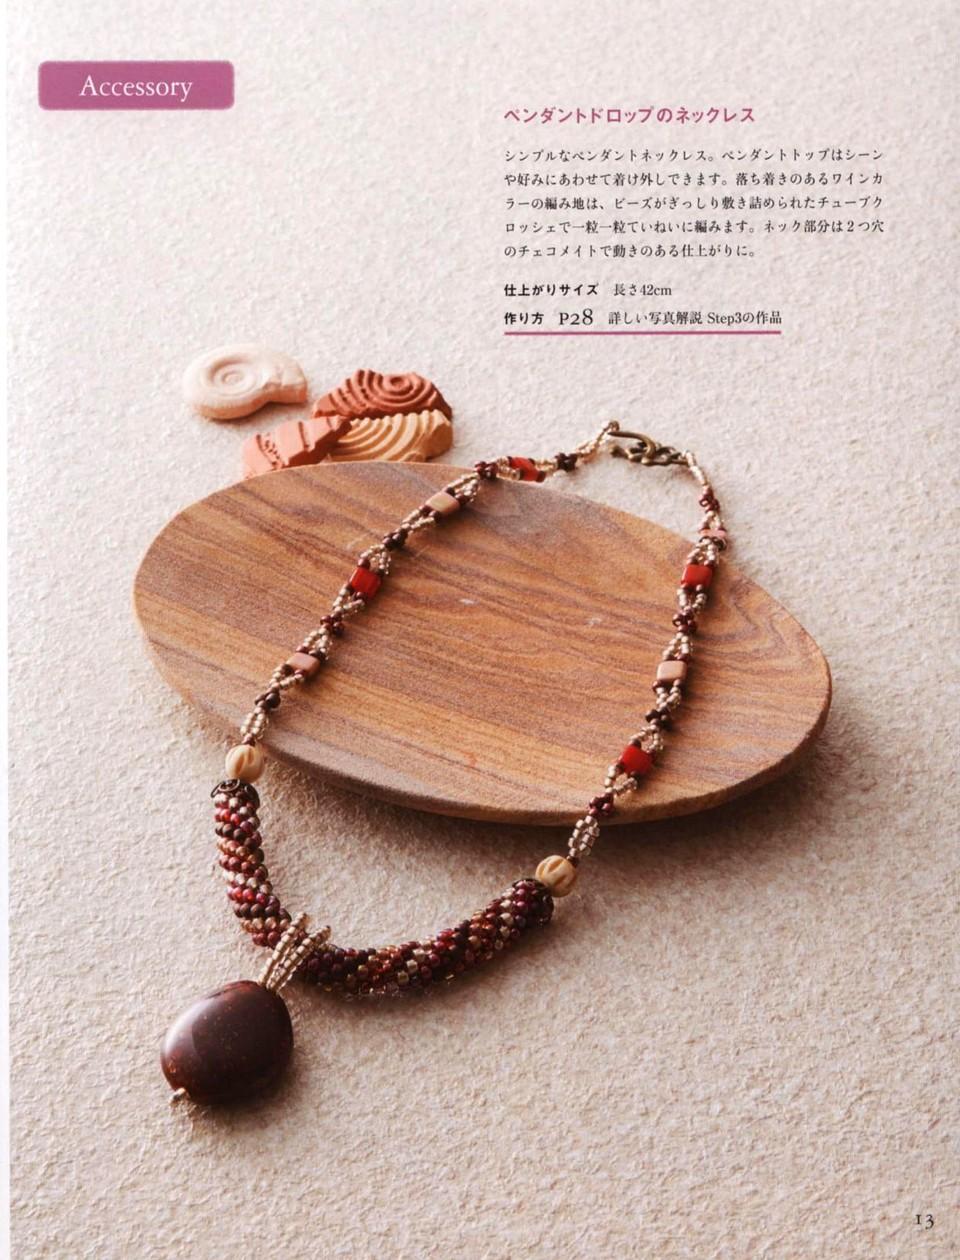 717 Beads Crochet 17-14